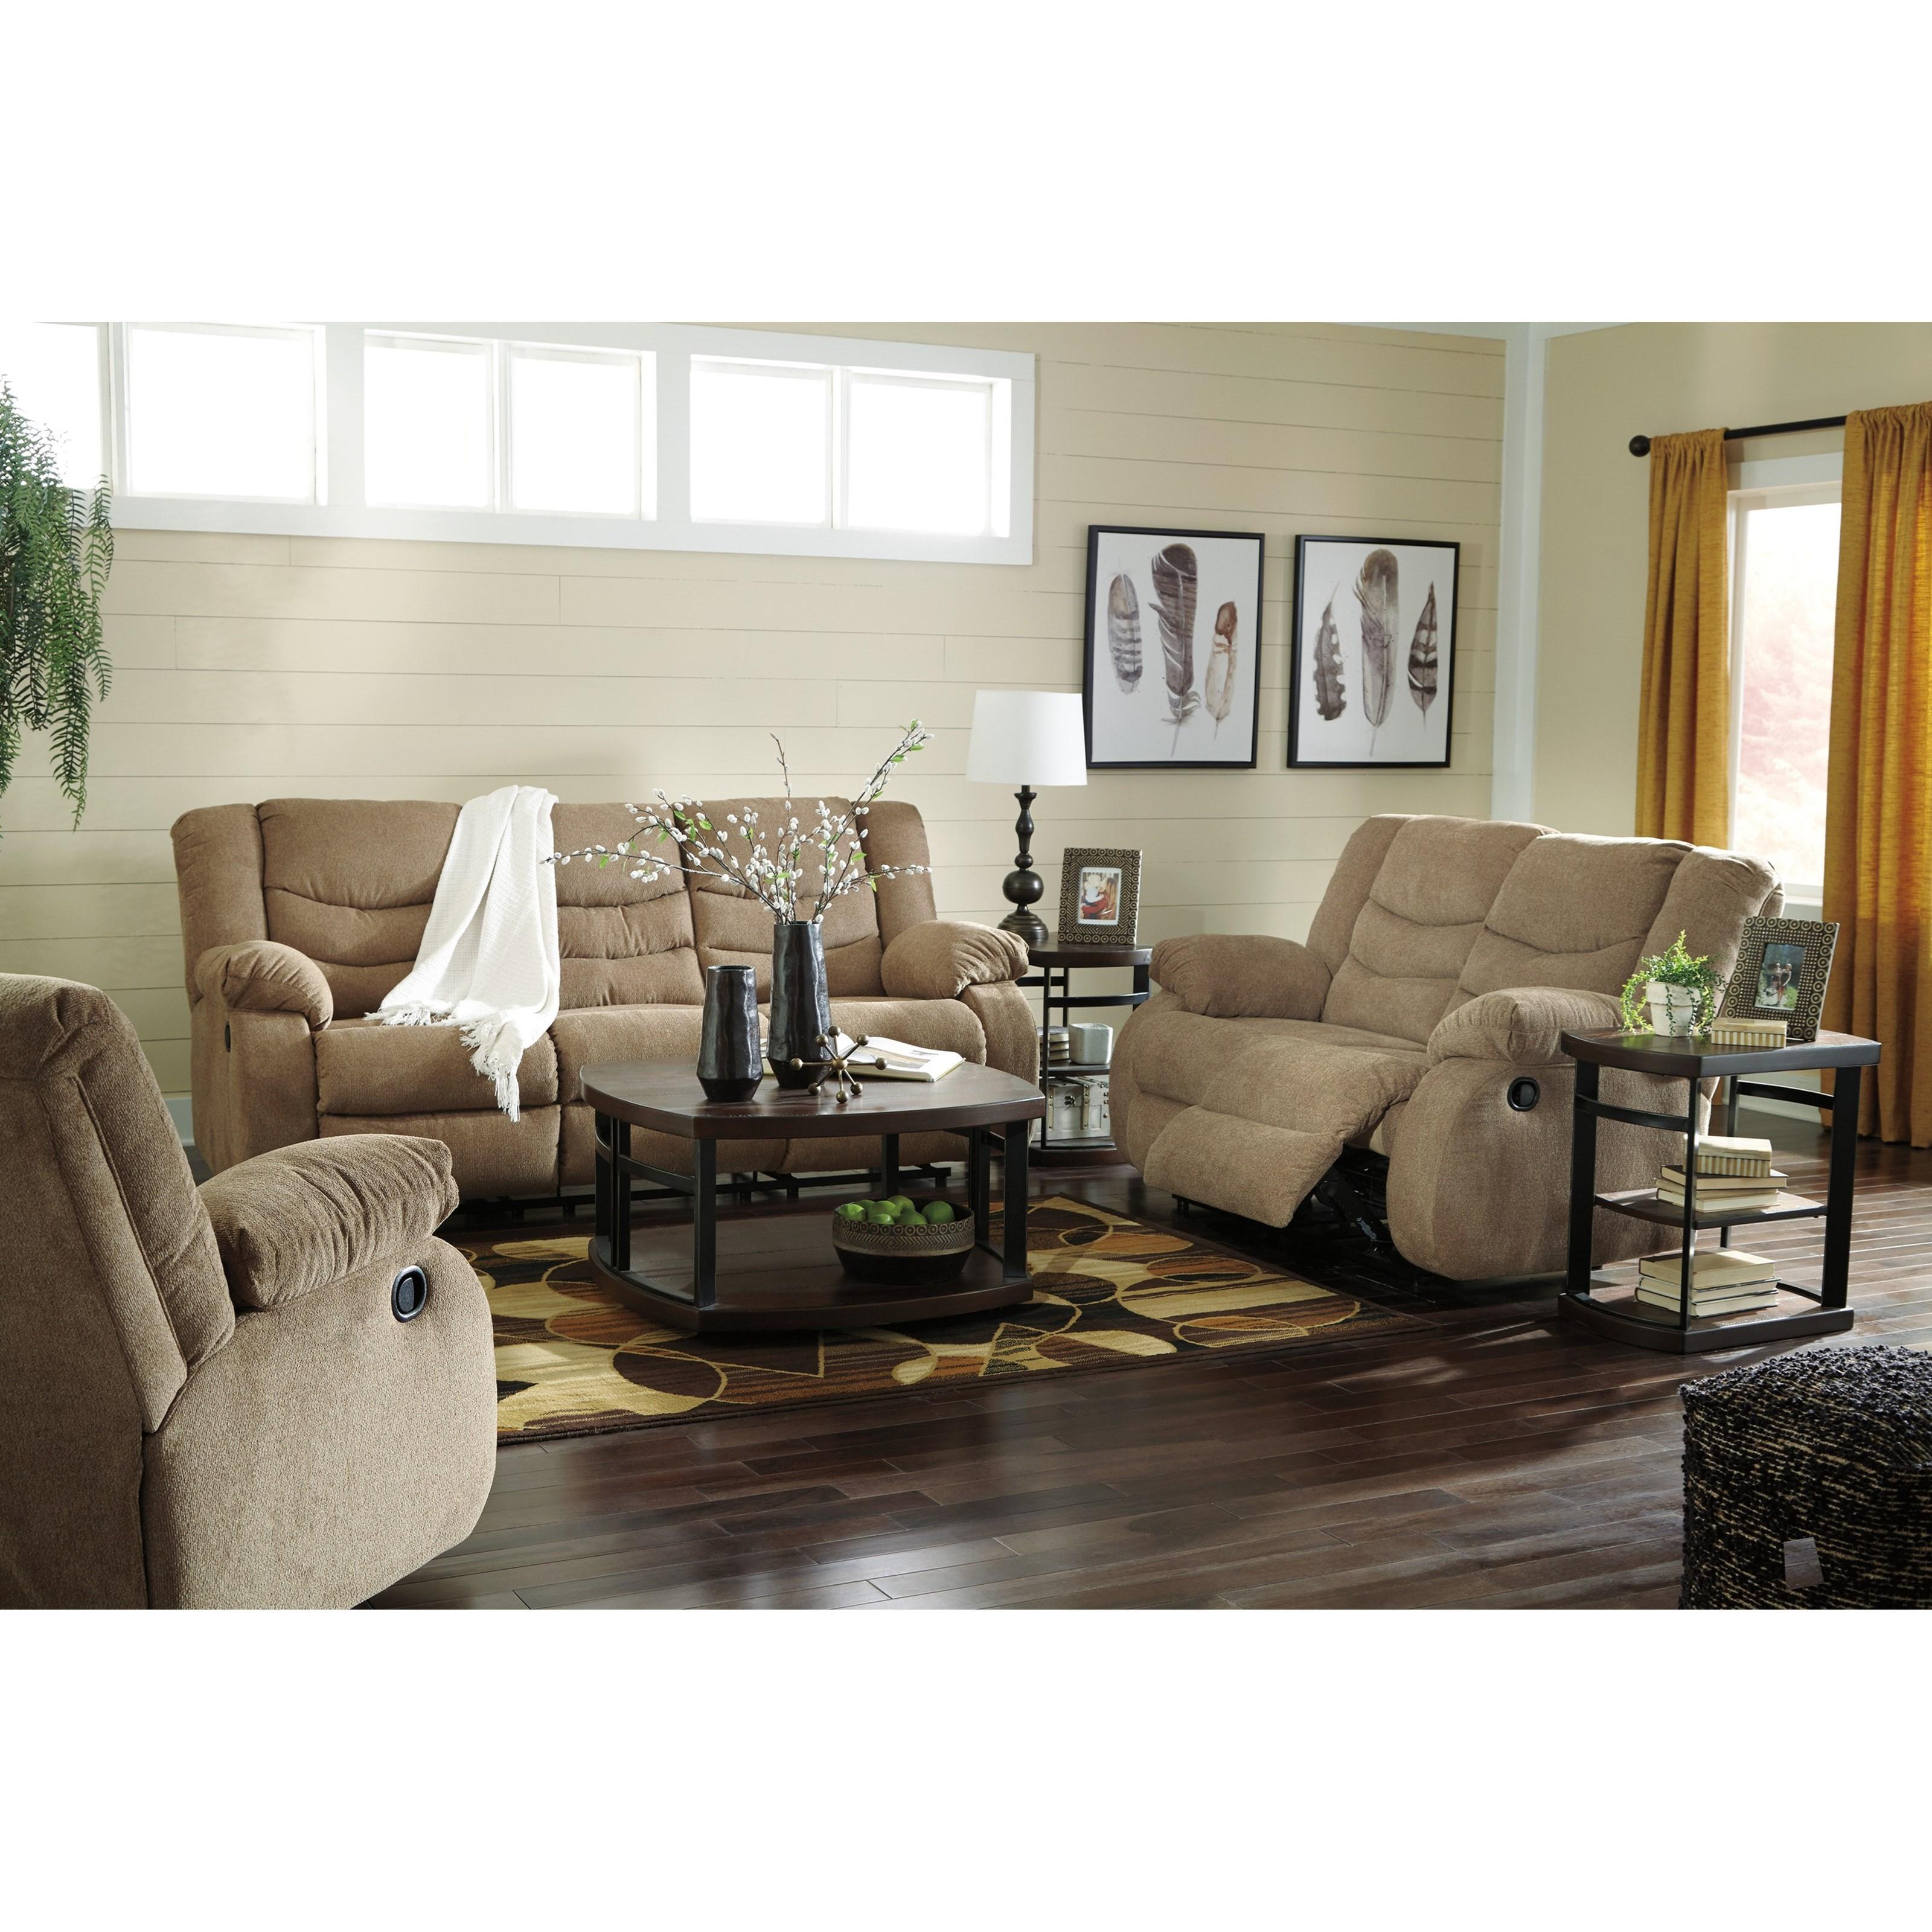 Signature design by ashley tulen 9860488 contemporary Living room furniture reclining sofa